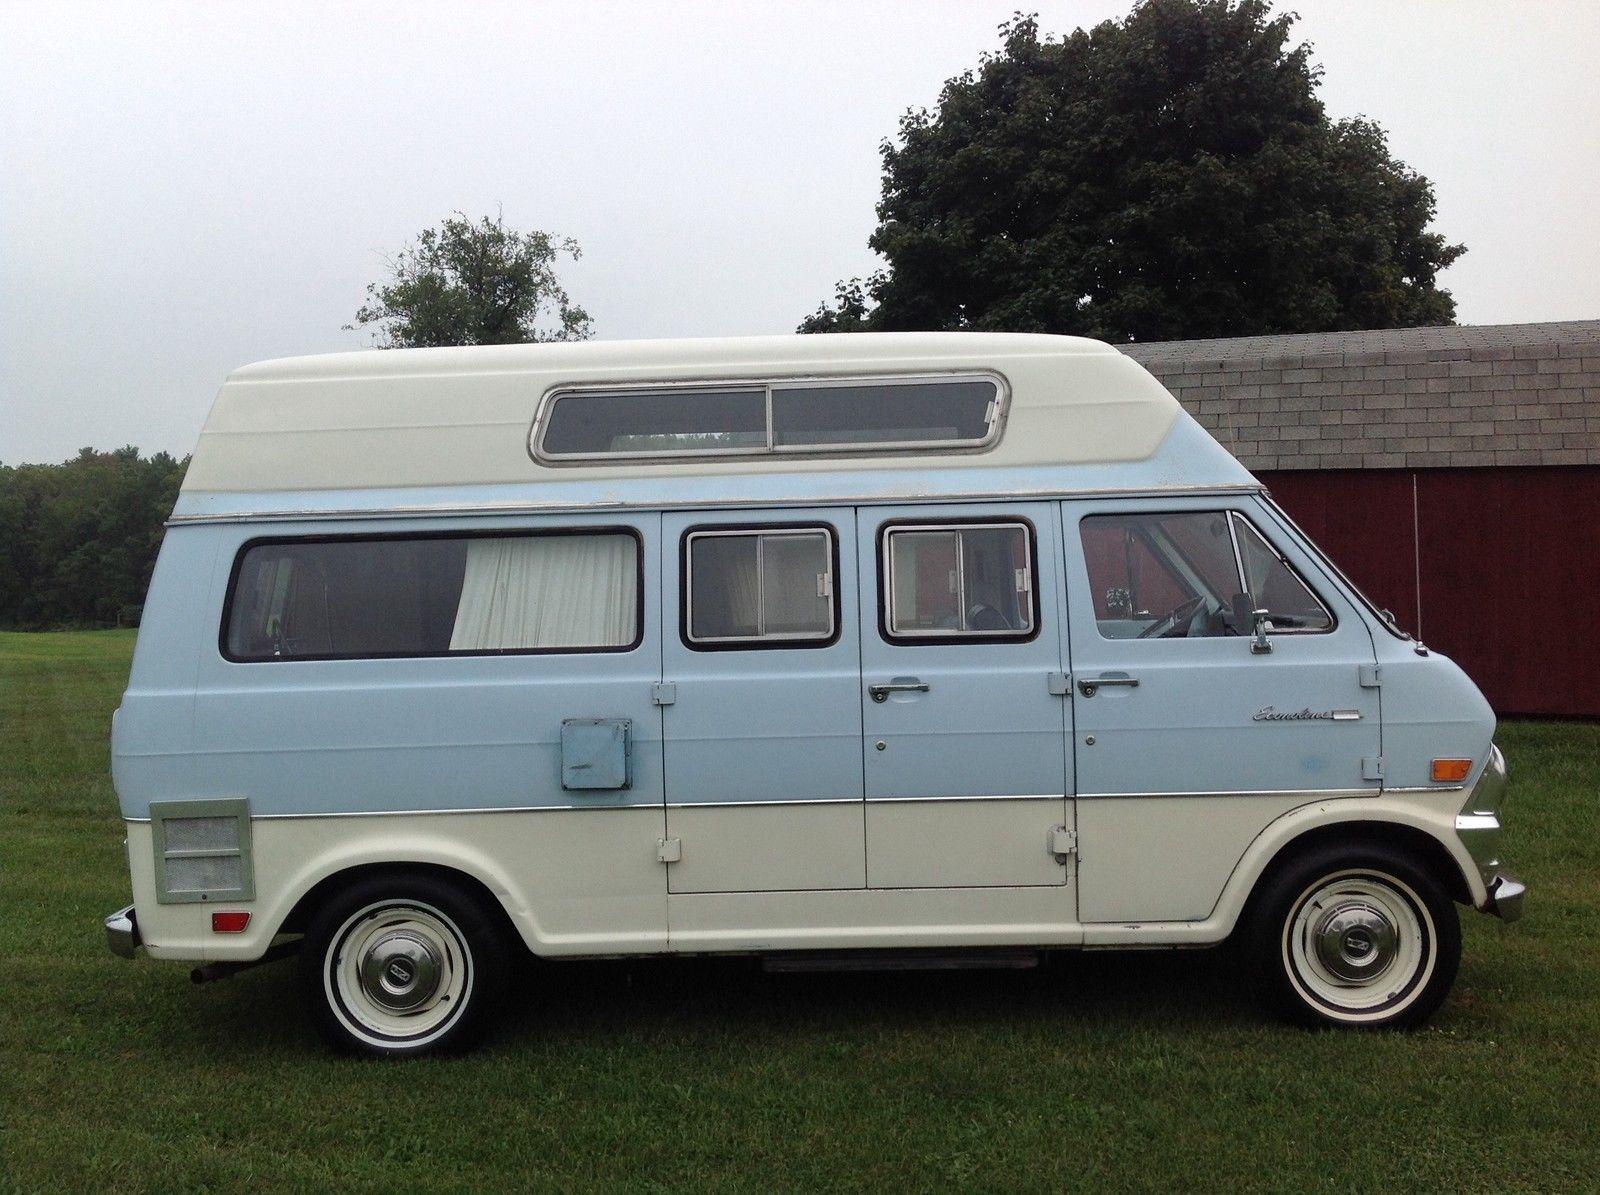 1969 ford econoline super van camper classic ford e. Black Bedroom Furniture Sets. Home Design Ideas